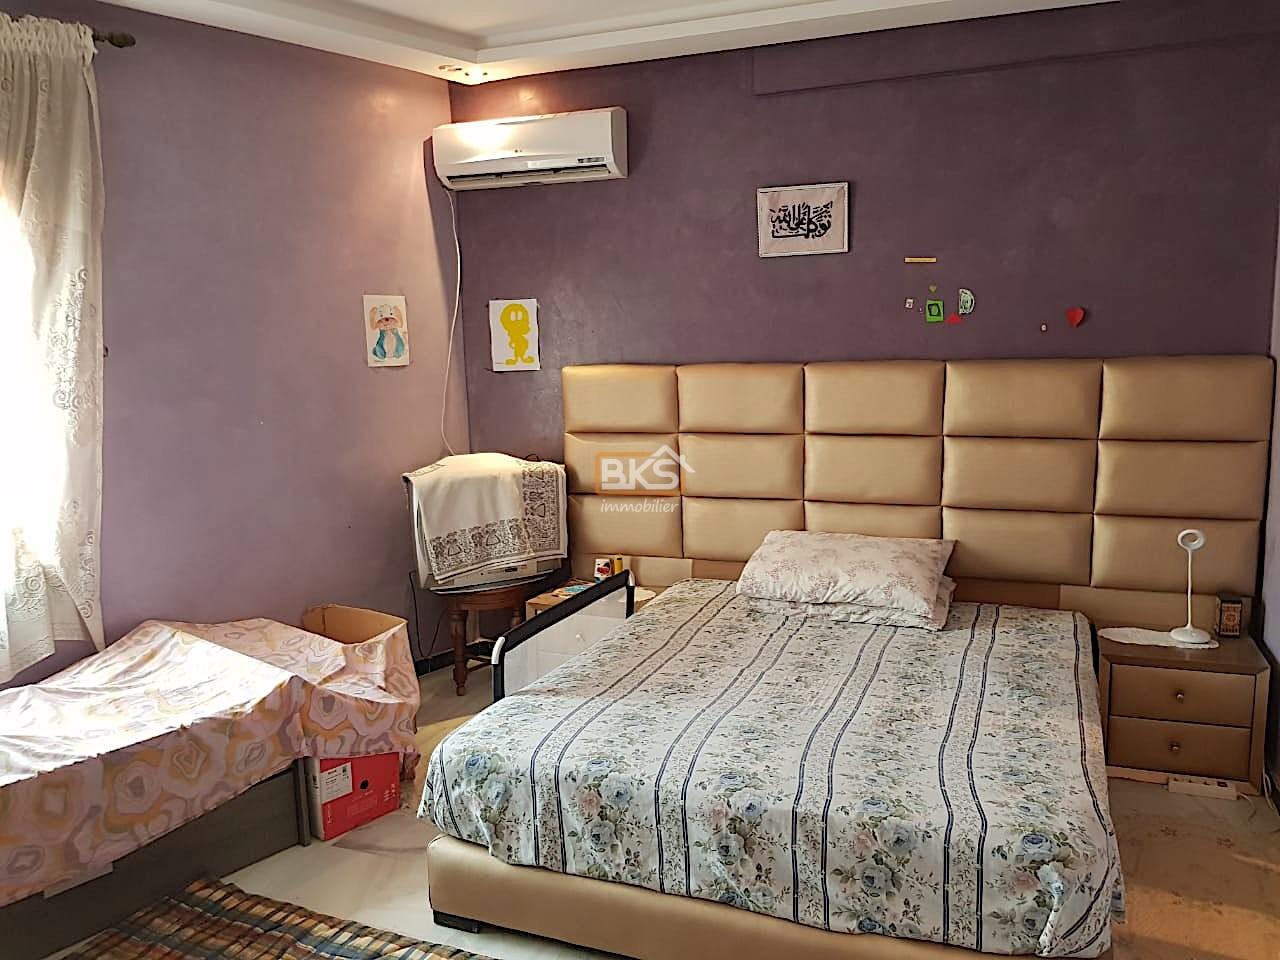 Vente <strong>Appartement</strong> Marrakech gueliz <strong>84 m2</strong>